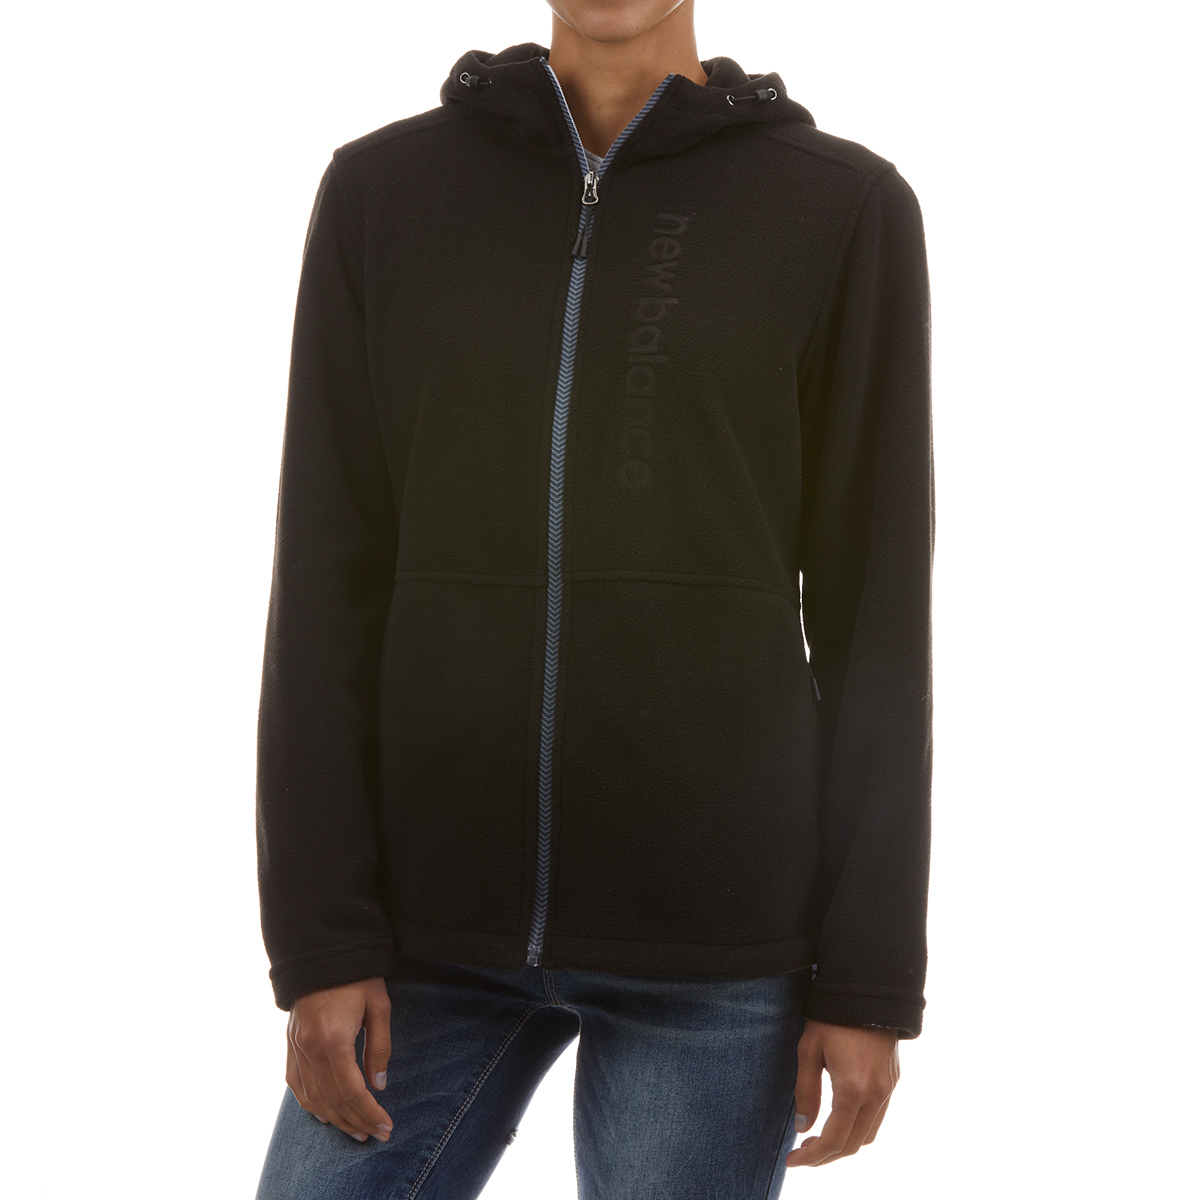 New Balance Women's Full Zip Hooded Fleece With Embossed Logo - Black, XL